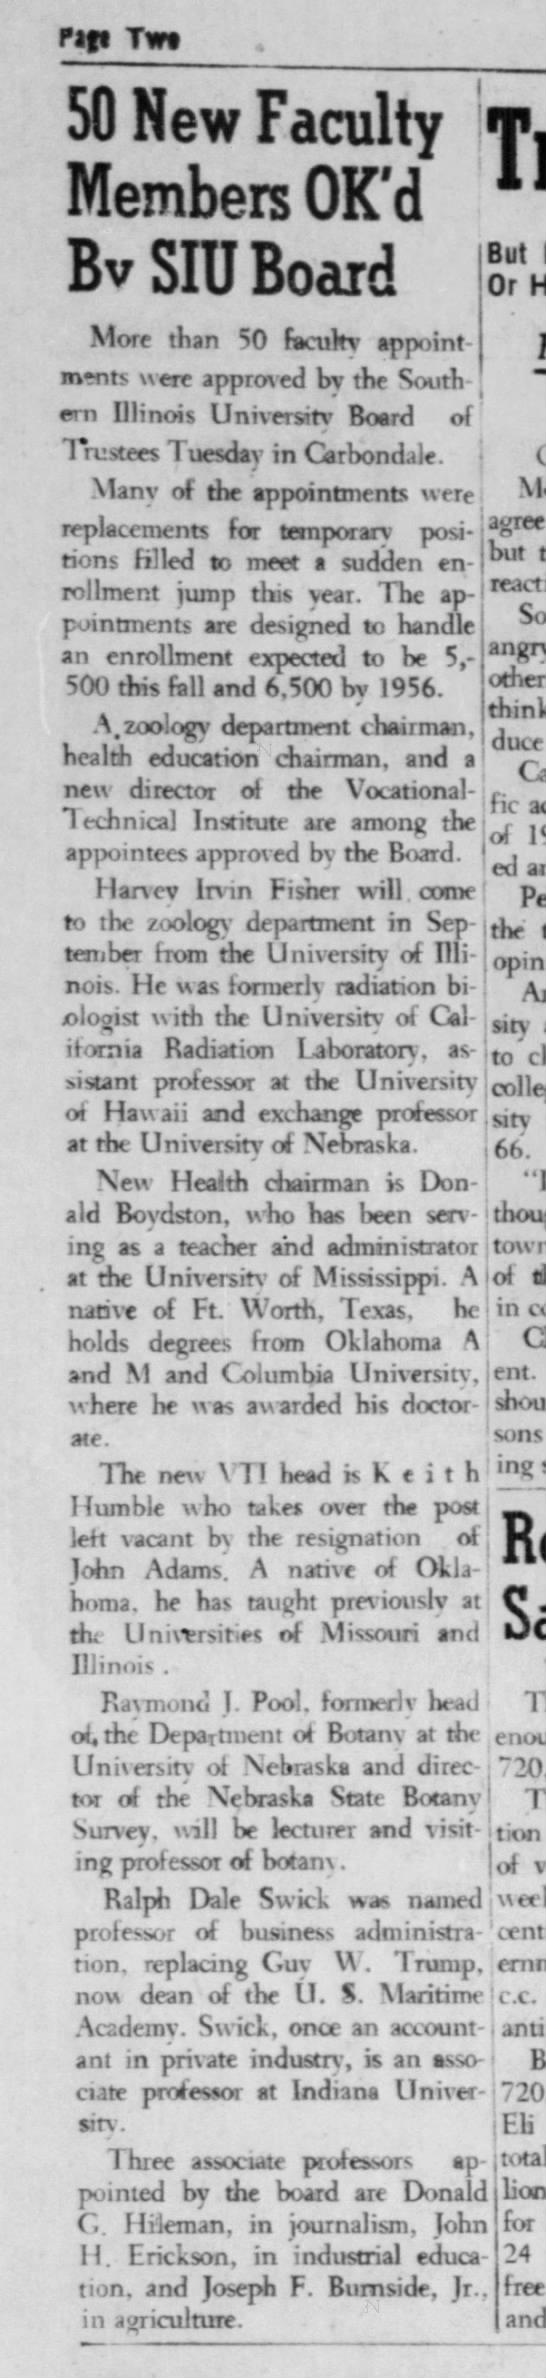 1955-07-13 50 New Faculty Members OK'd by SIU Board -